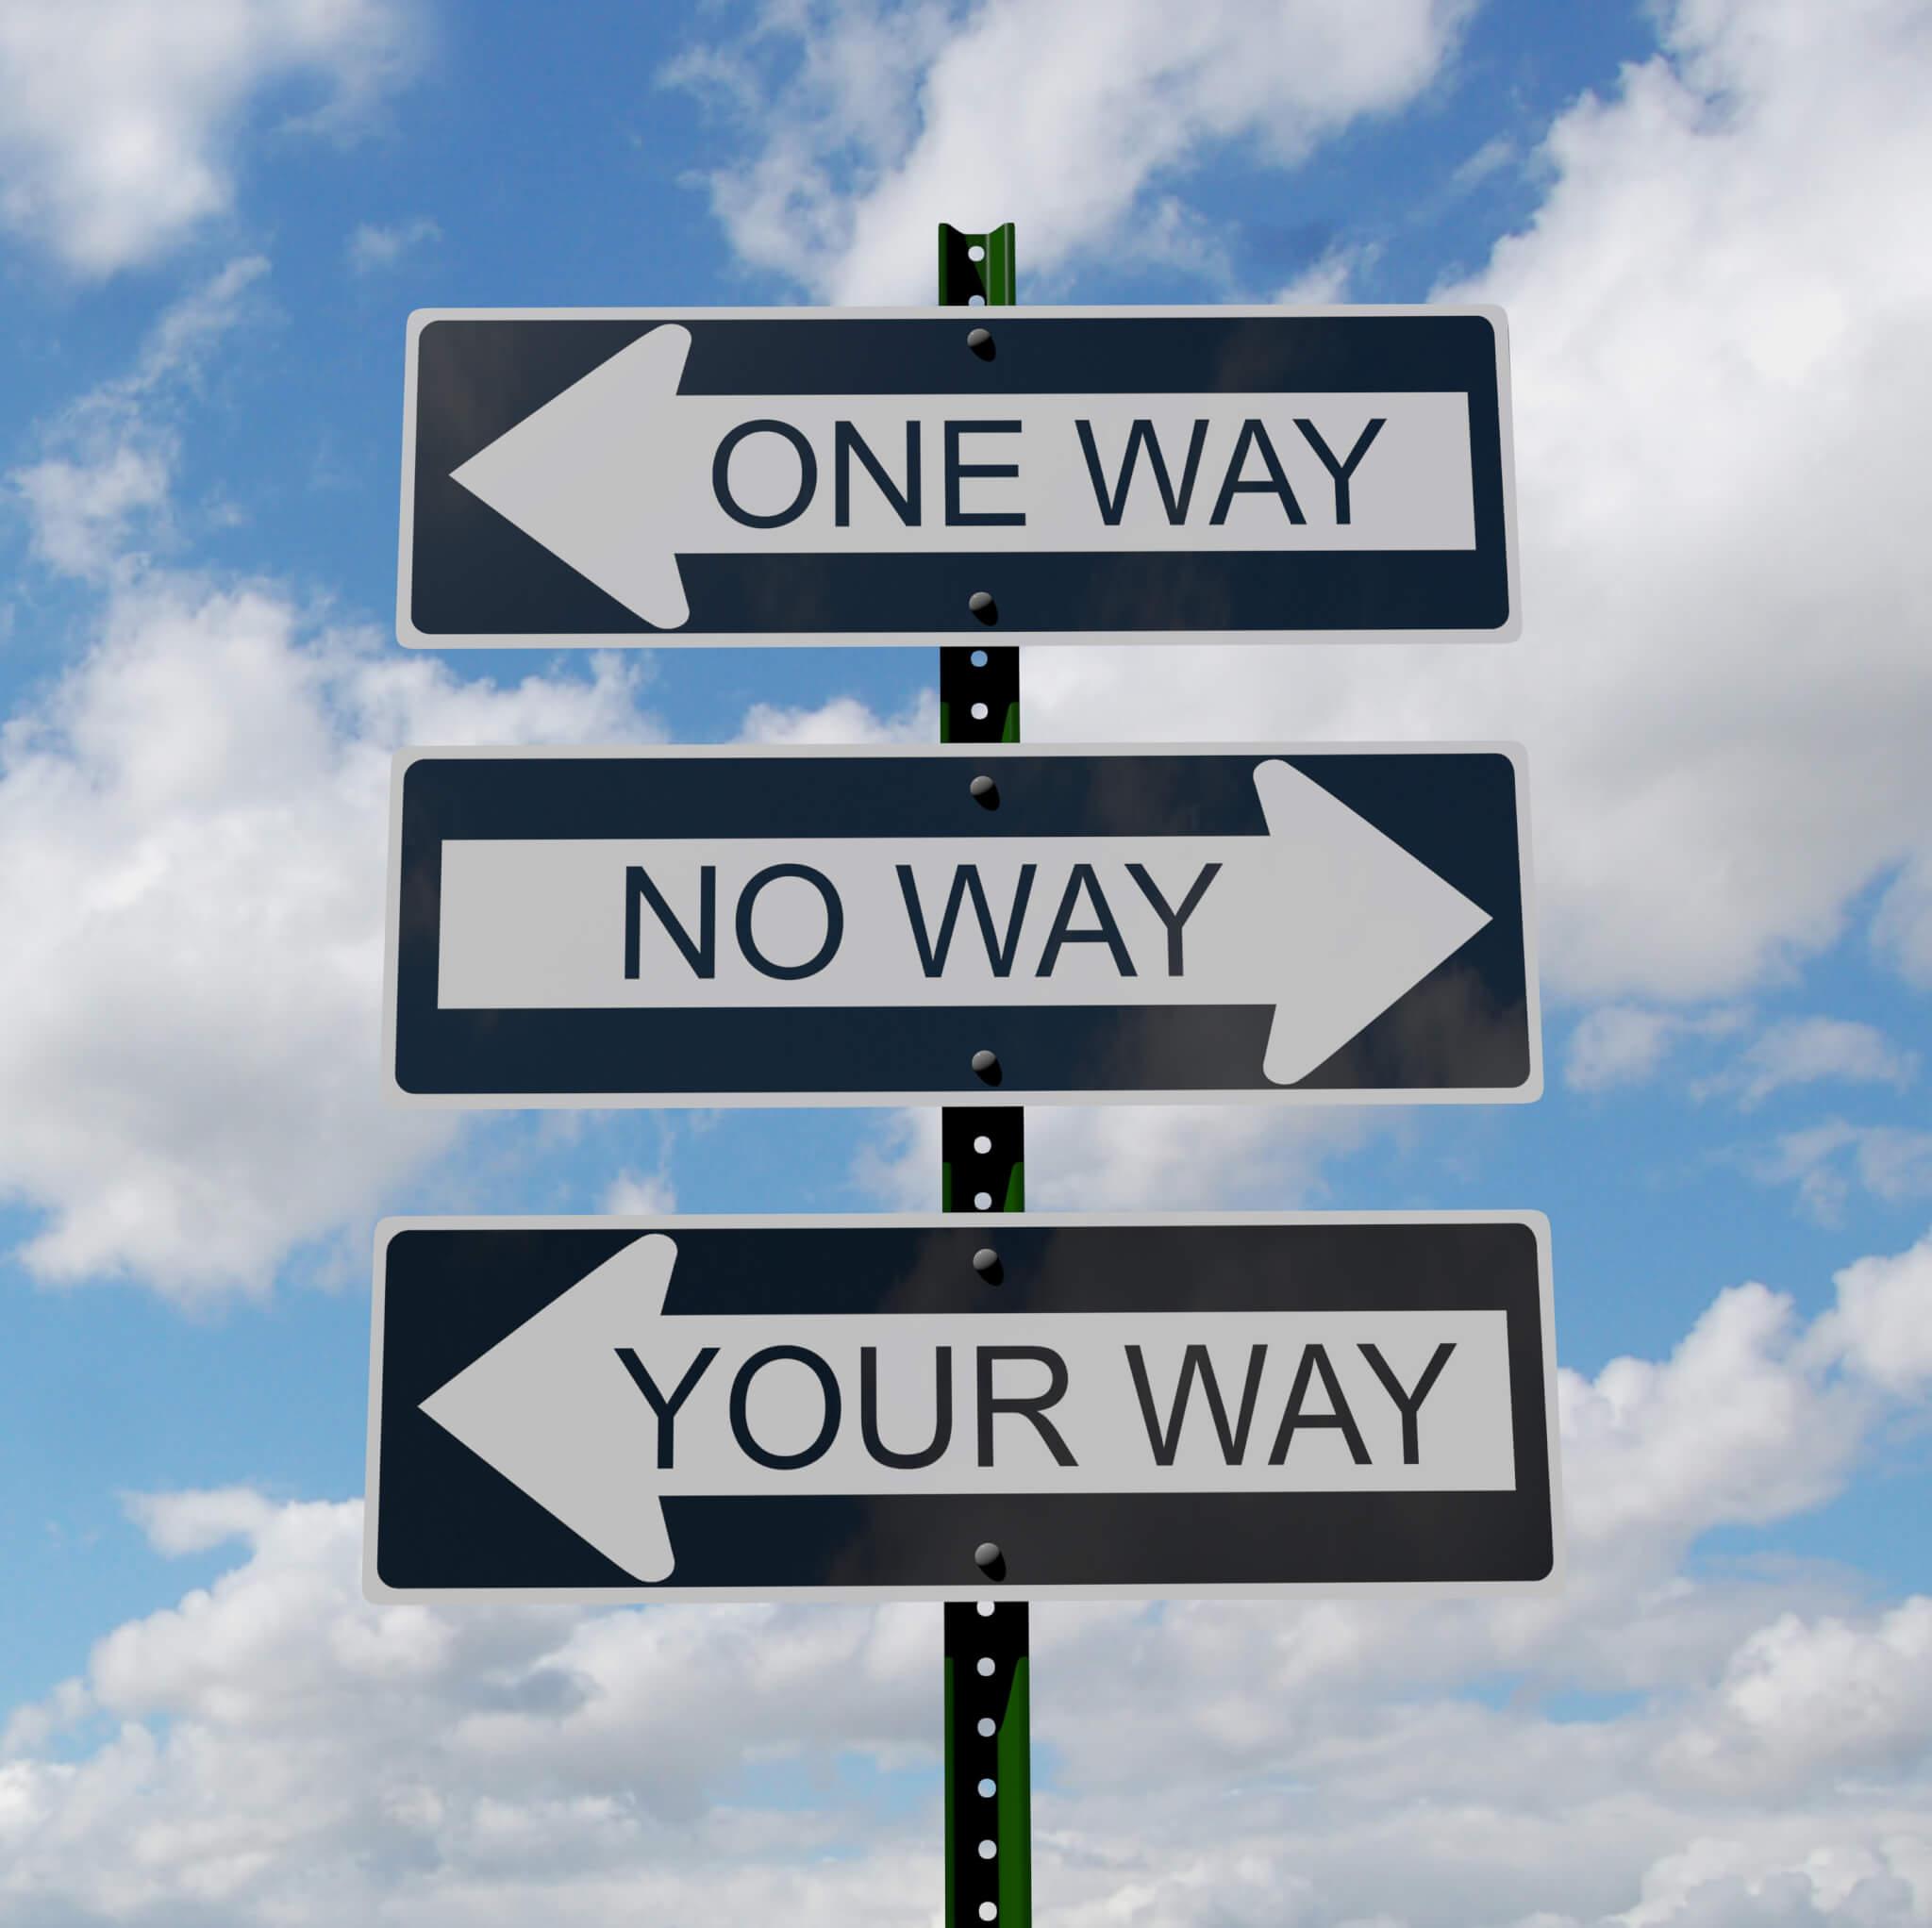 One way no way